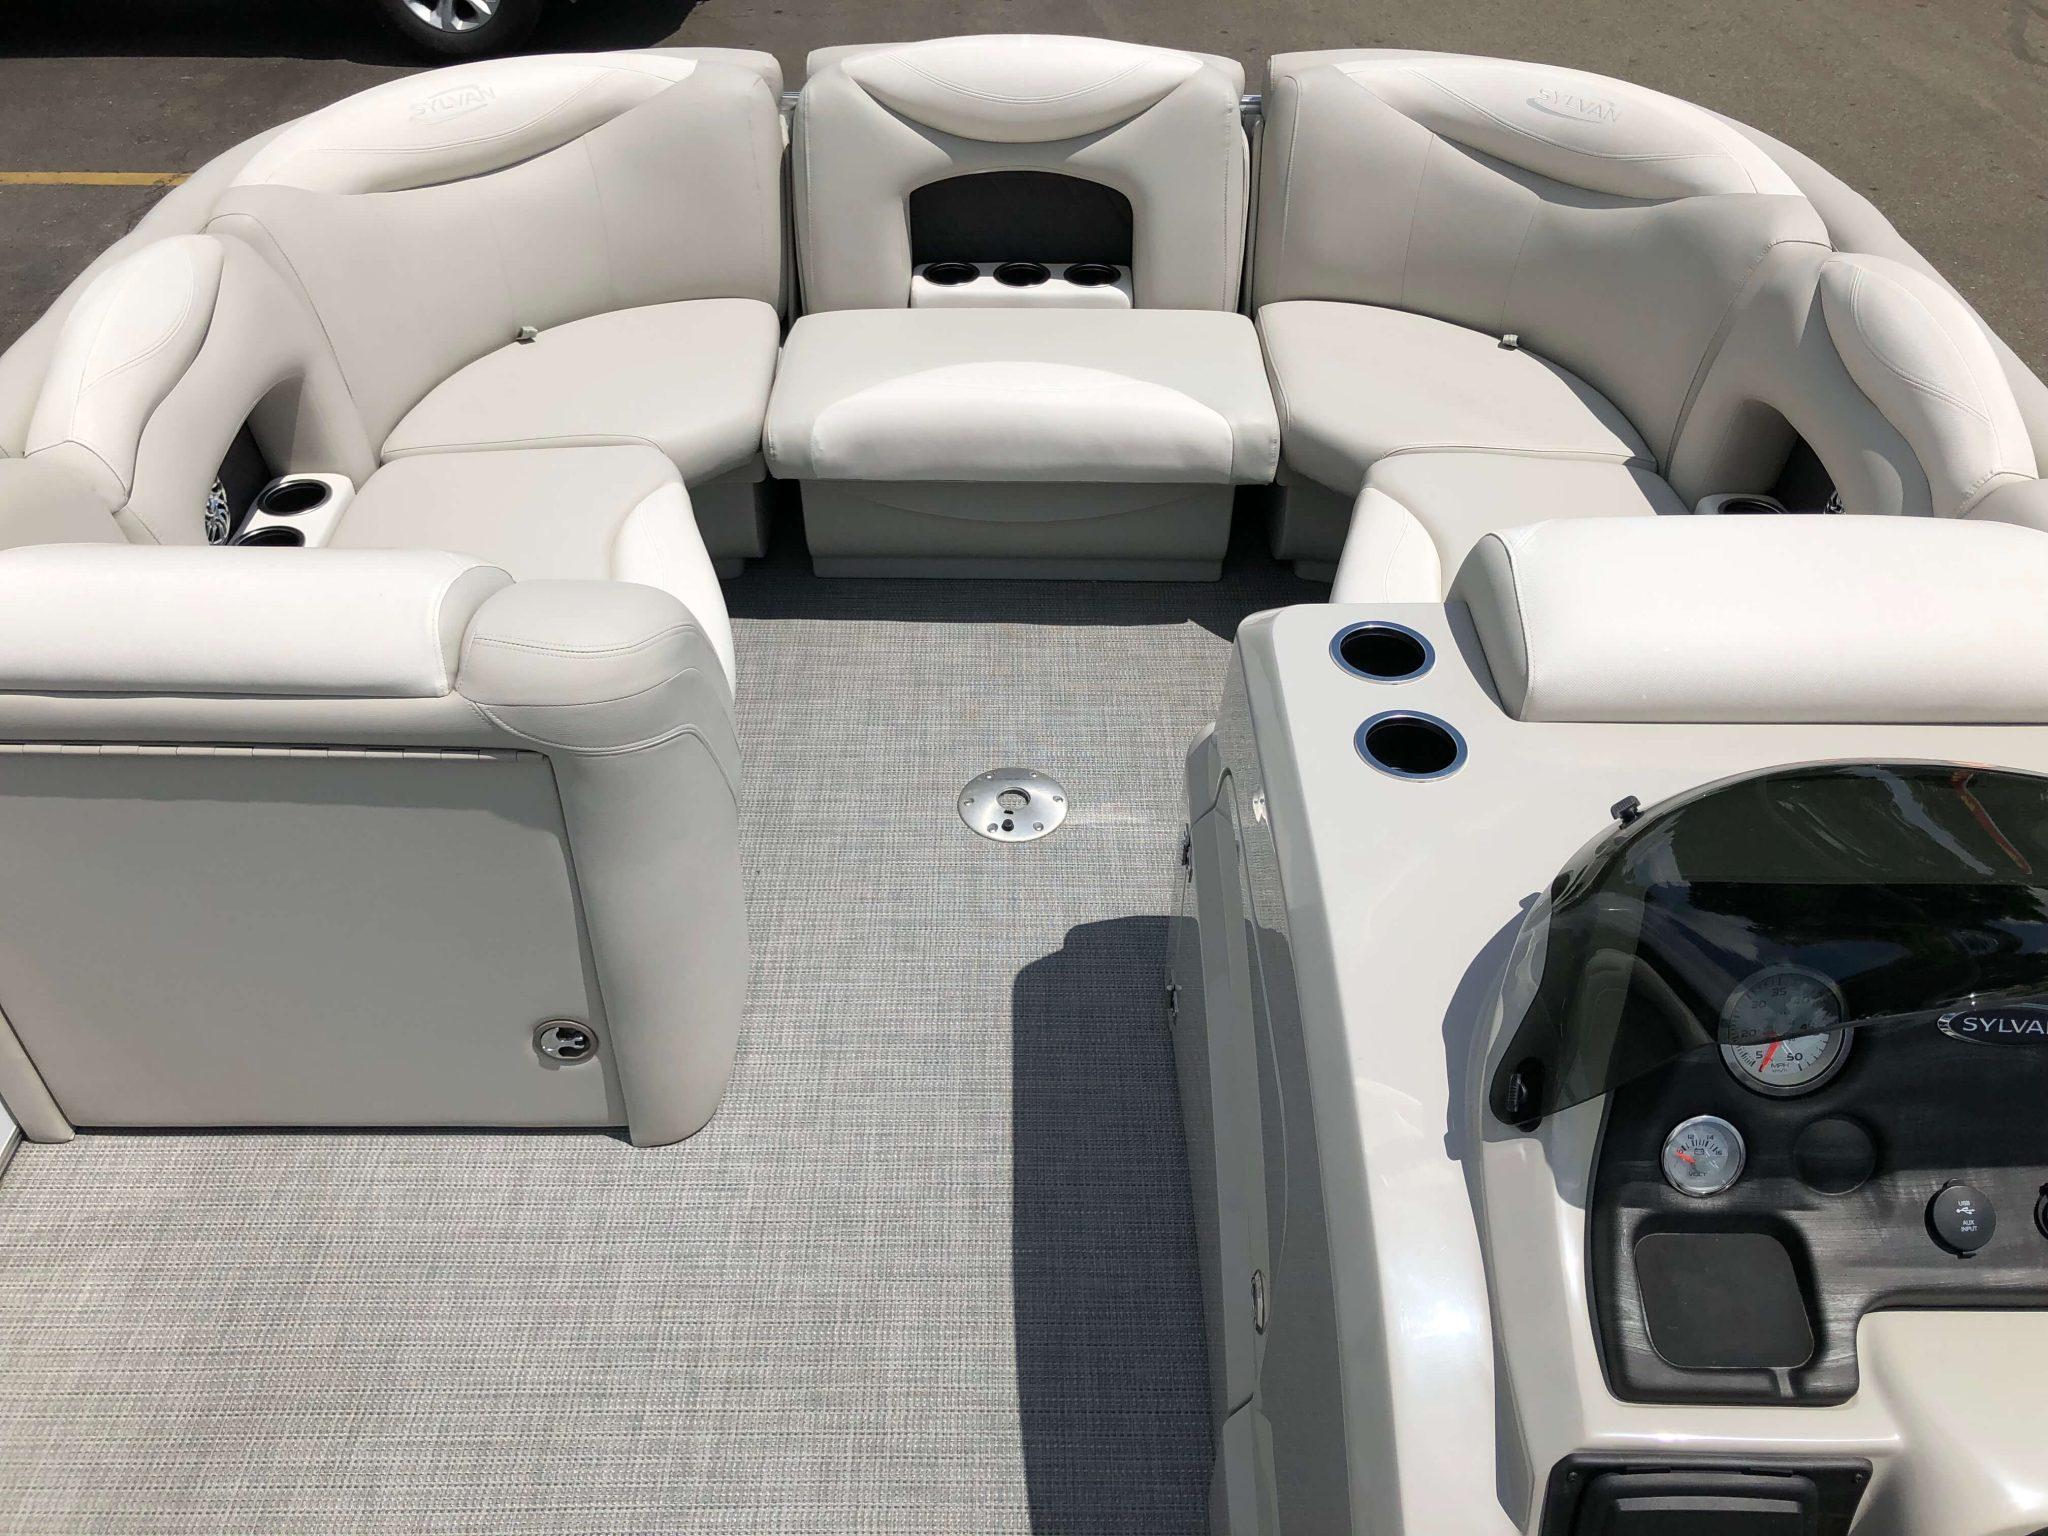 2016 Sylvan 8520 LZ LES Pontoon Boat Layout 5